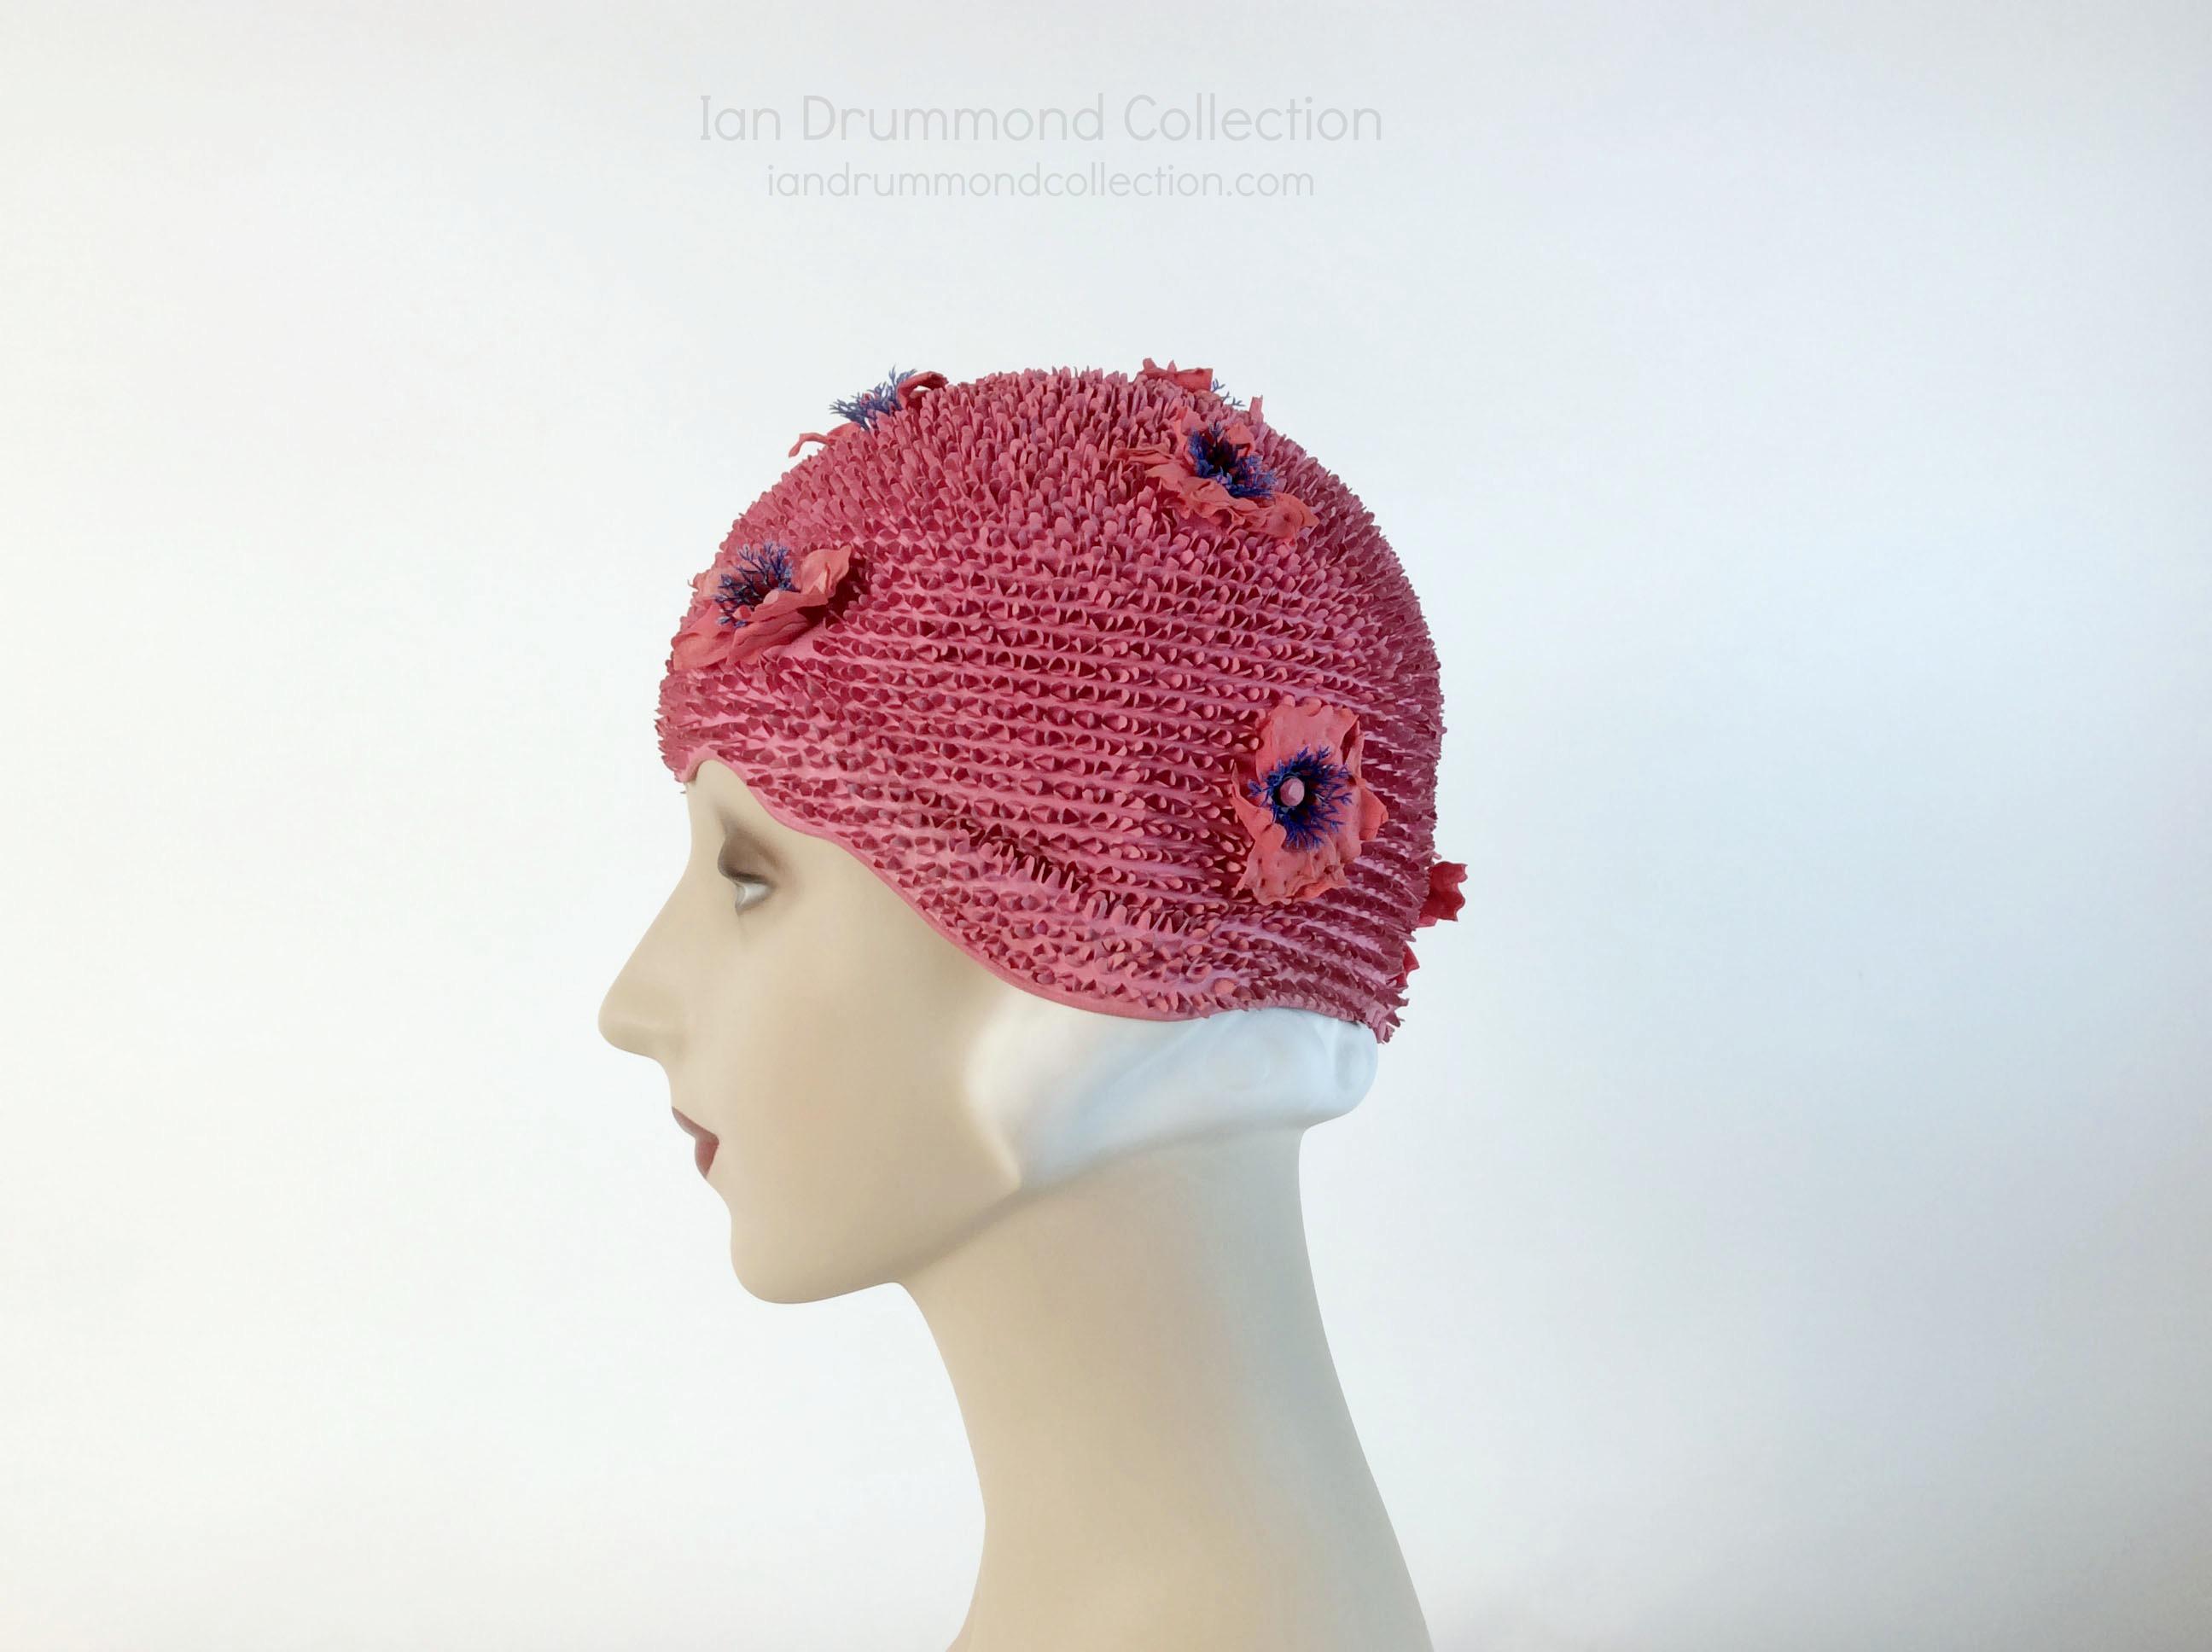 IDC Movie Wardrobe Rental Swim Cap 25 Pink with Small Bristles and Raised Flowers Deisgn